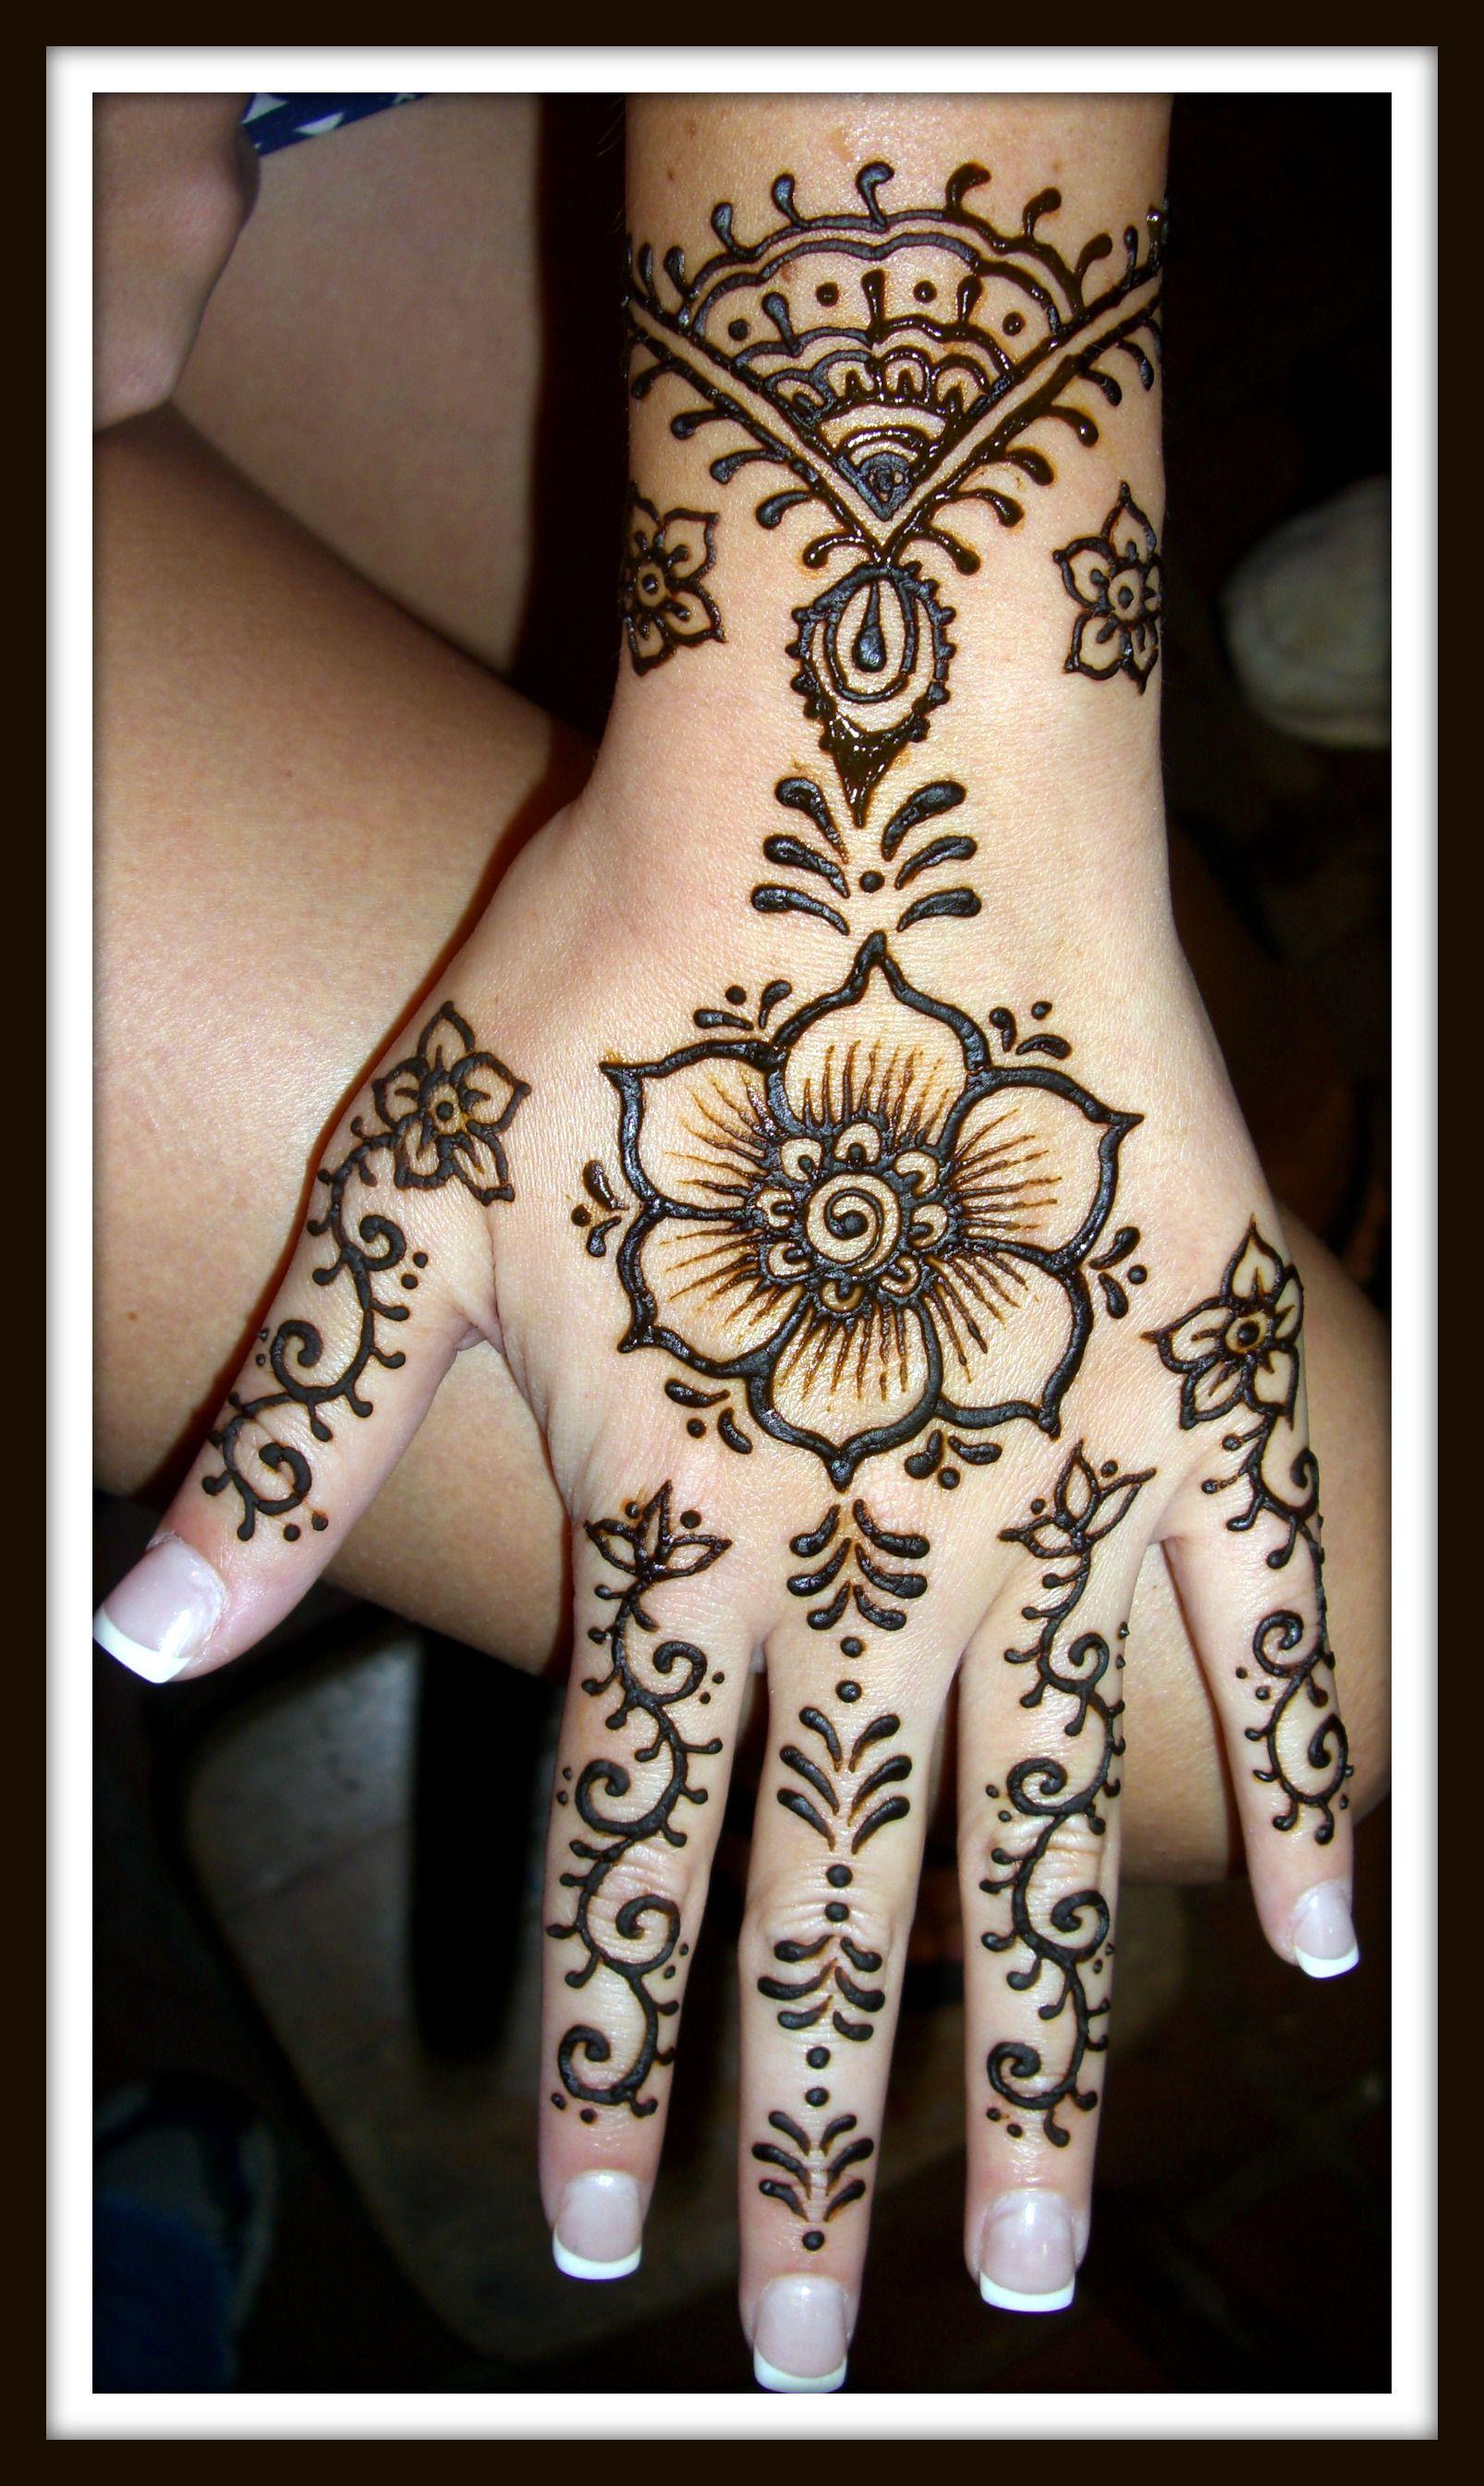 Henna Tattoo Designs For Love: Pin By Ronda On Piercing, Tattoo's, Mehndi